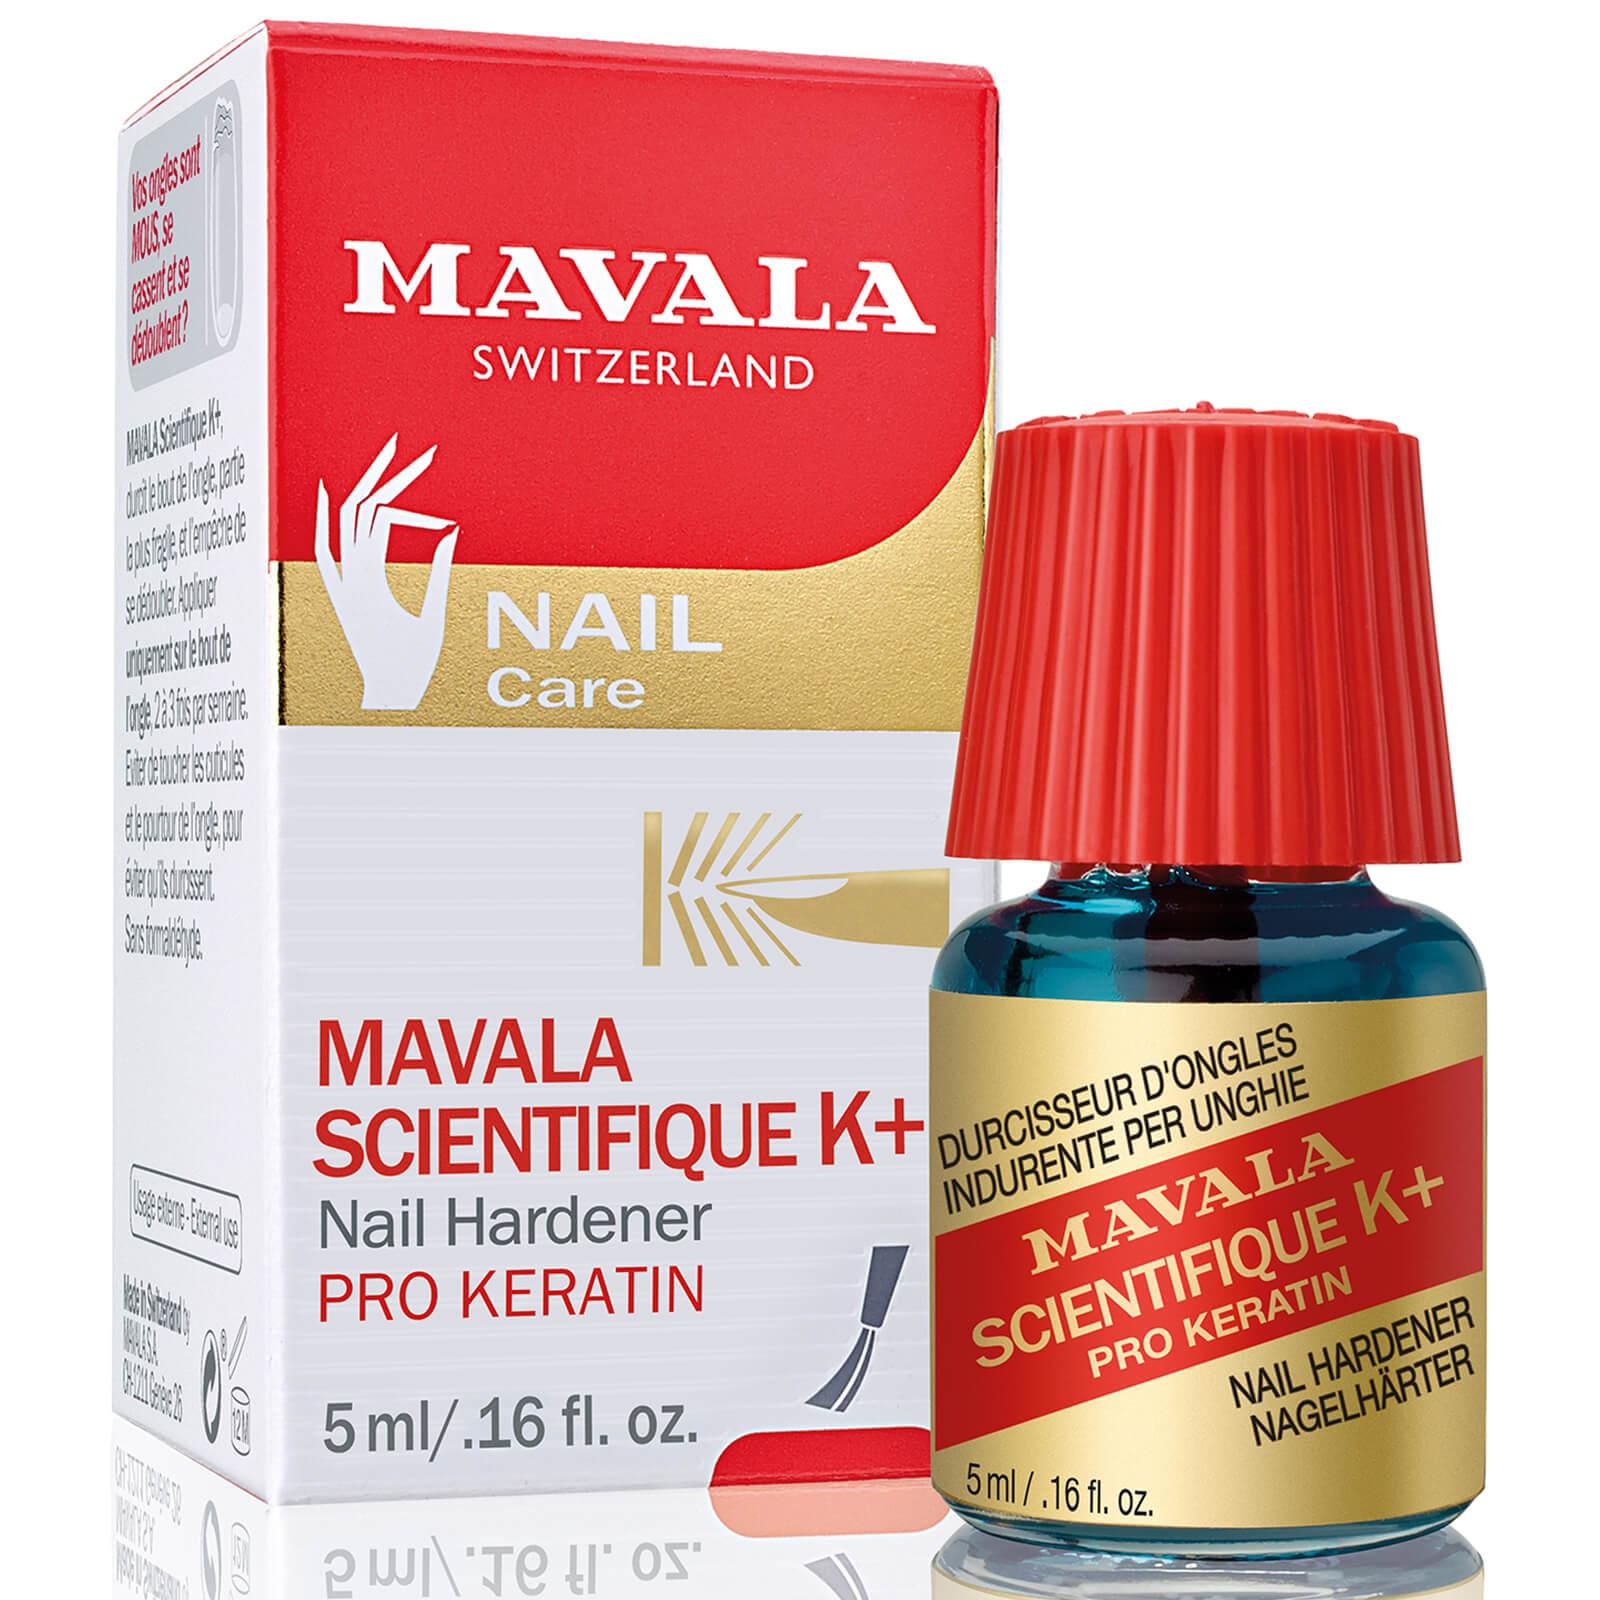 Endurecedor de uñas Scientifique K+ de Mavala